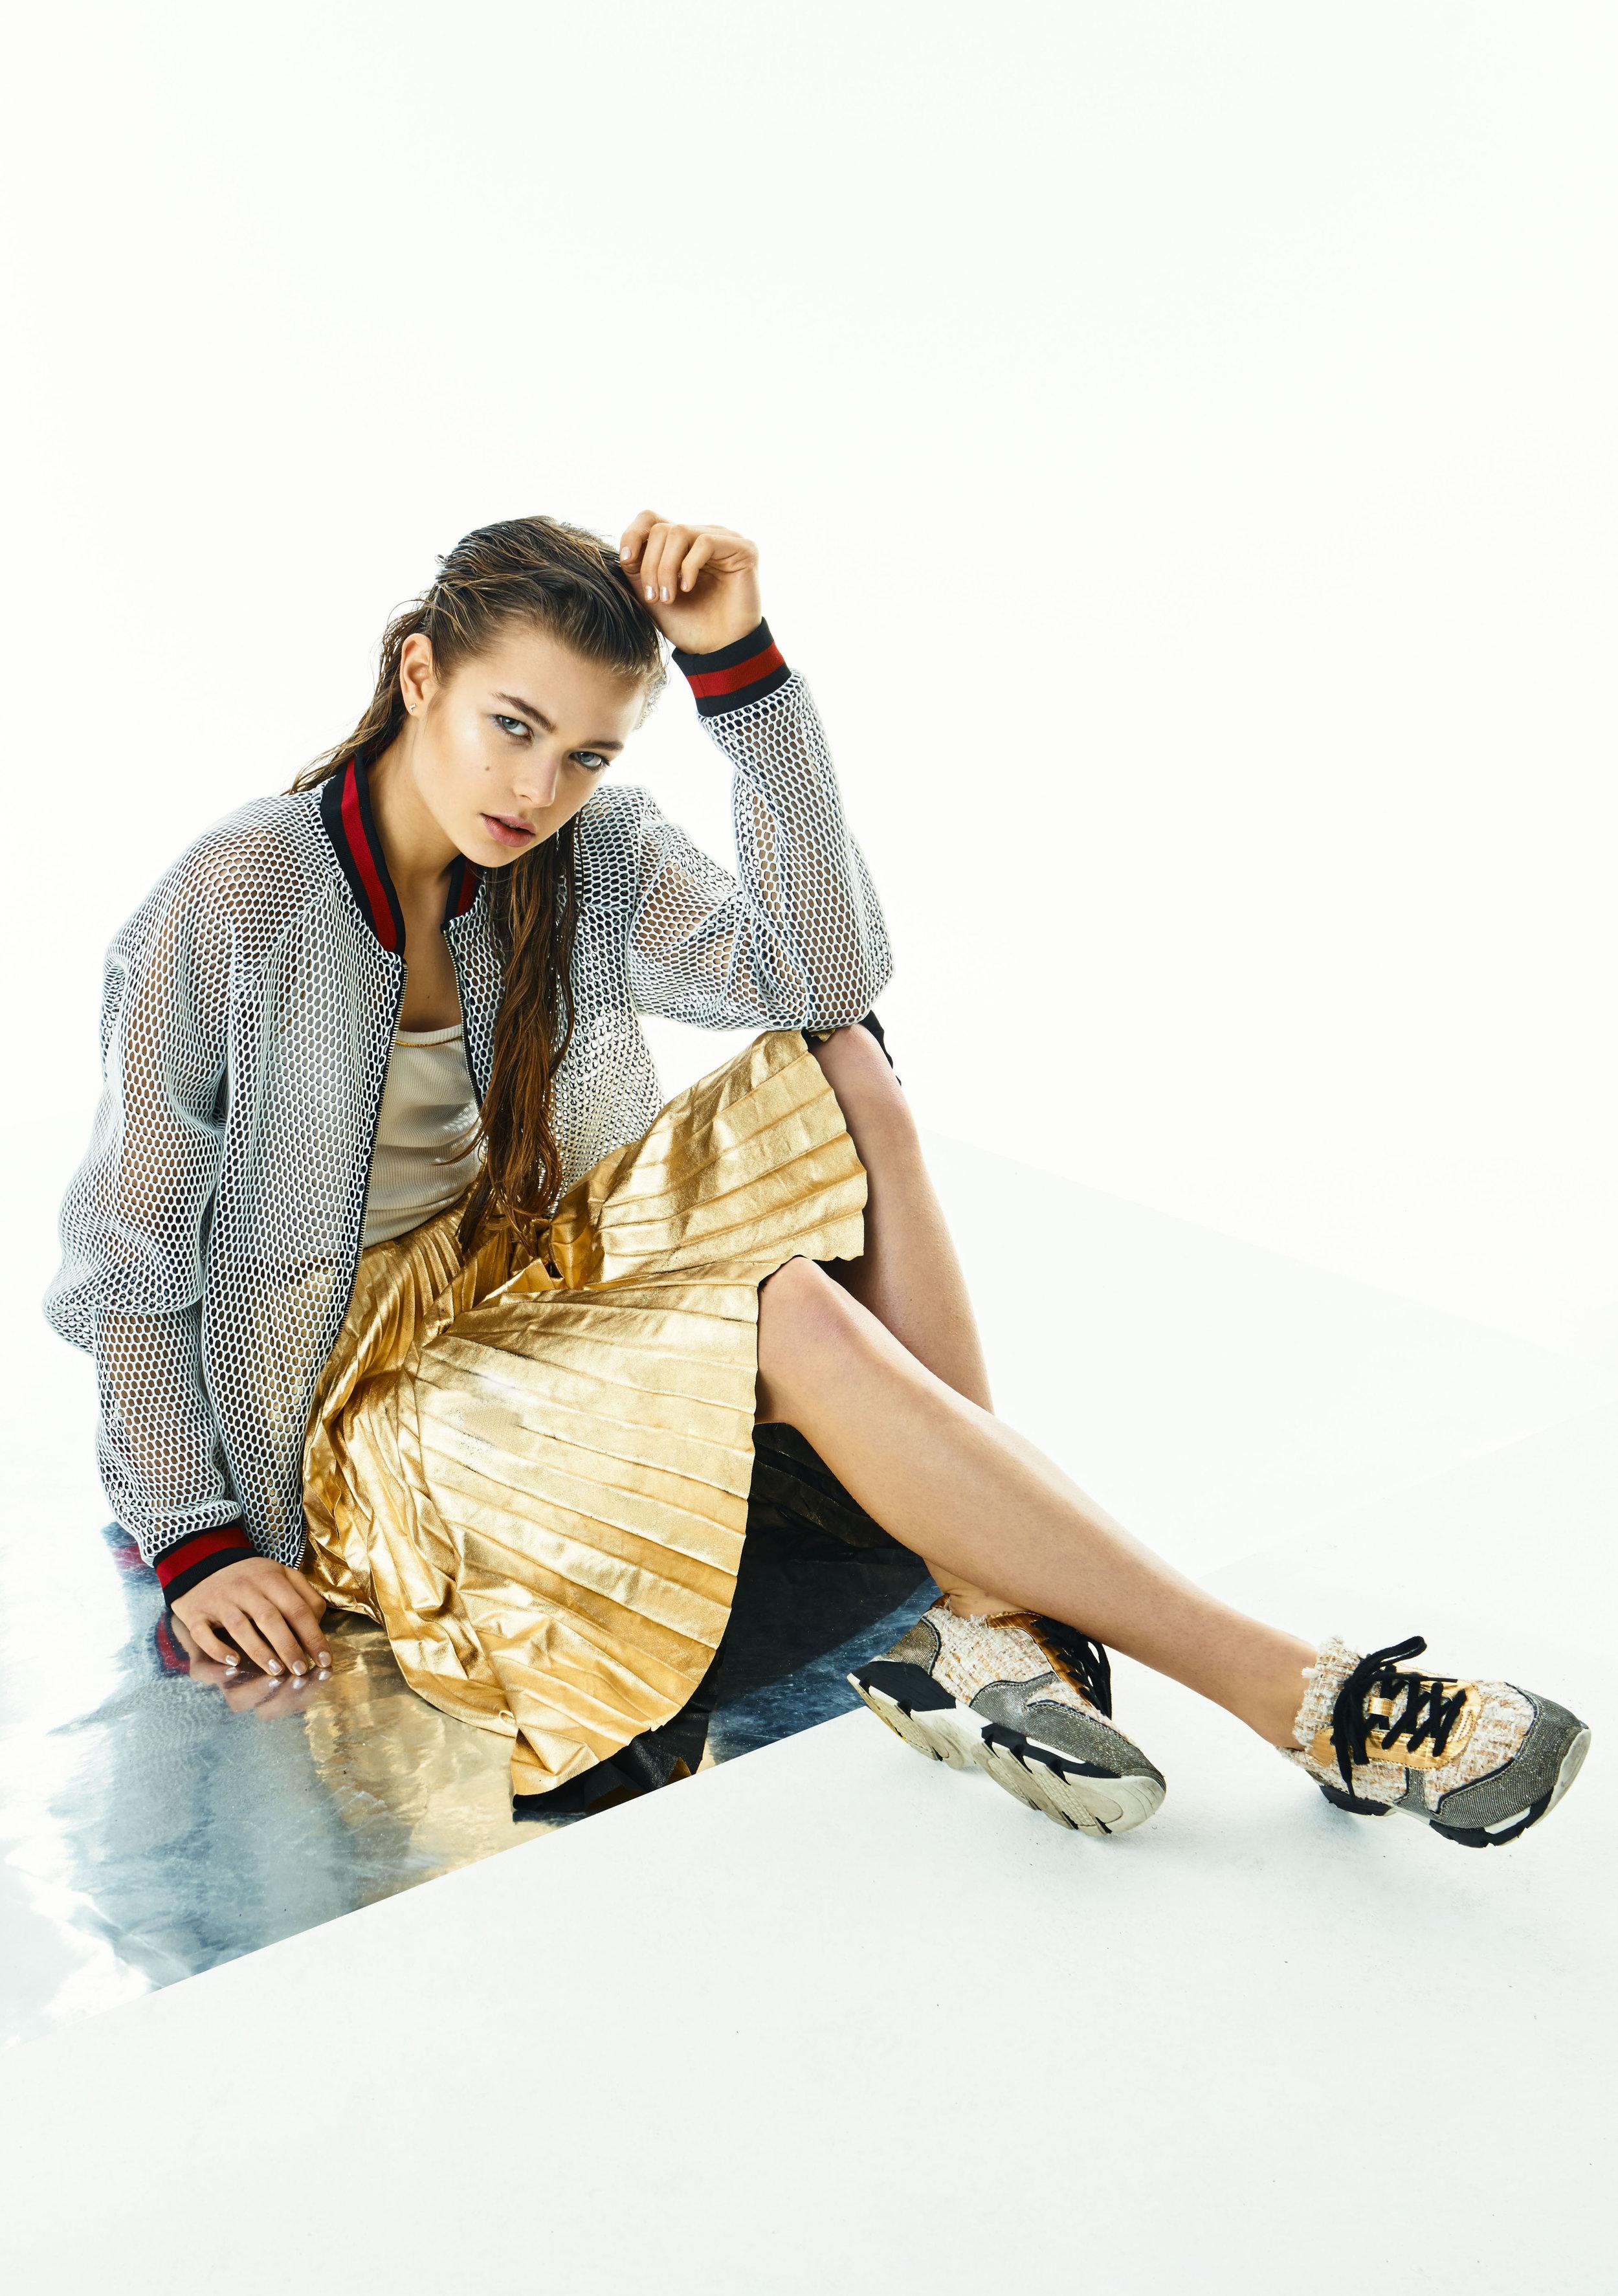 Top,Stine Goya; jacket,Apso; skirt,Privada; shoes,Bullboxer